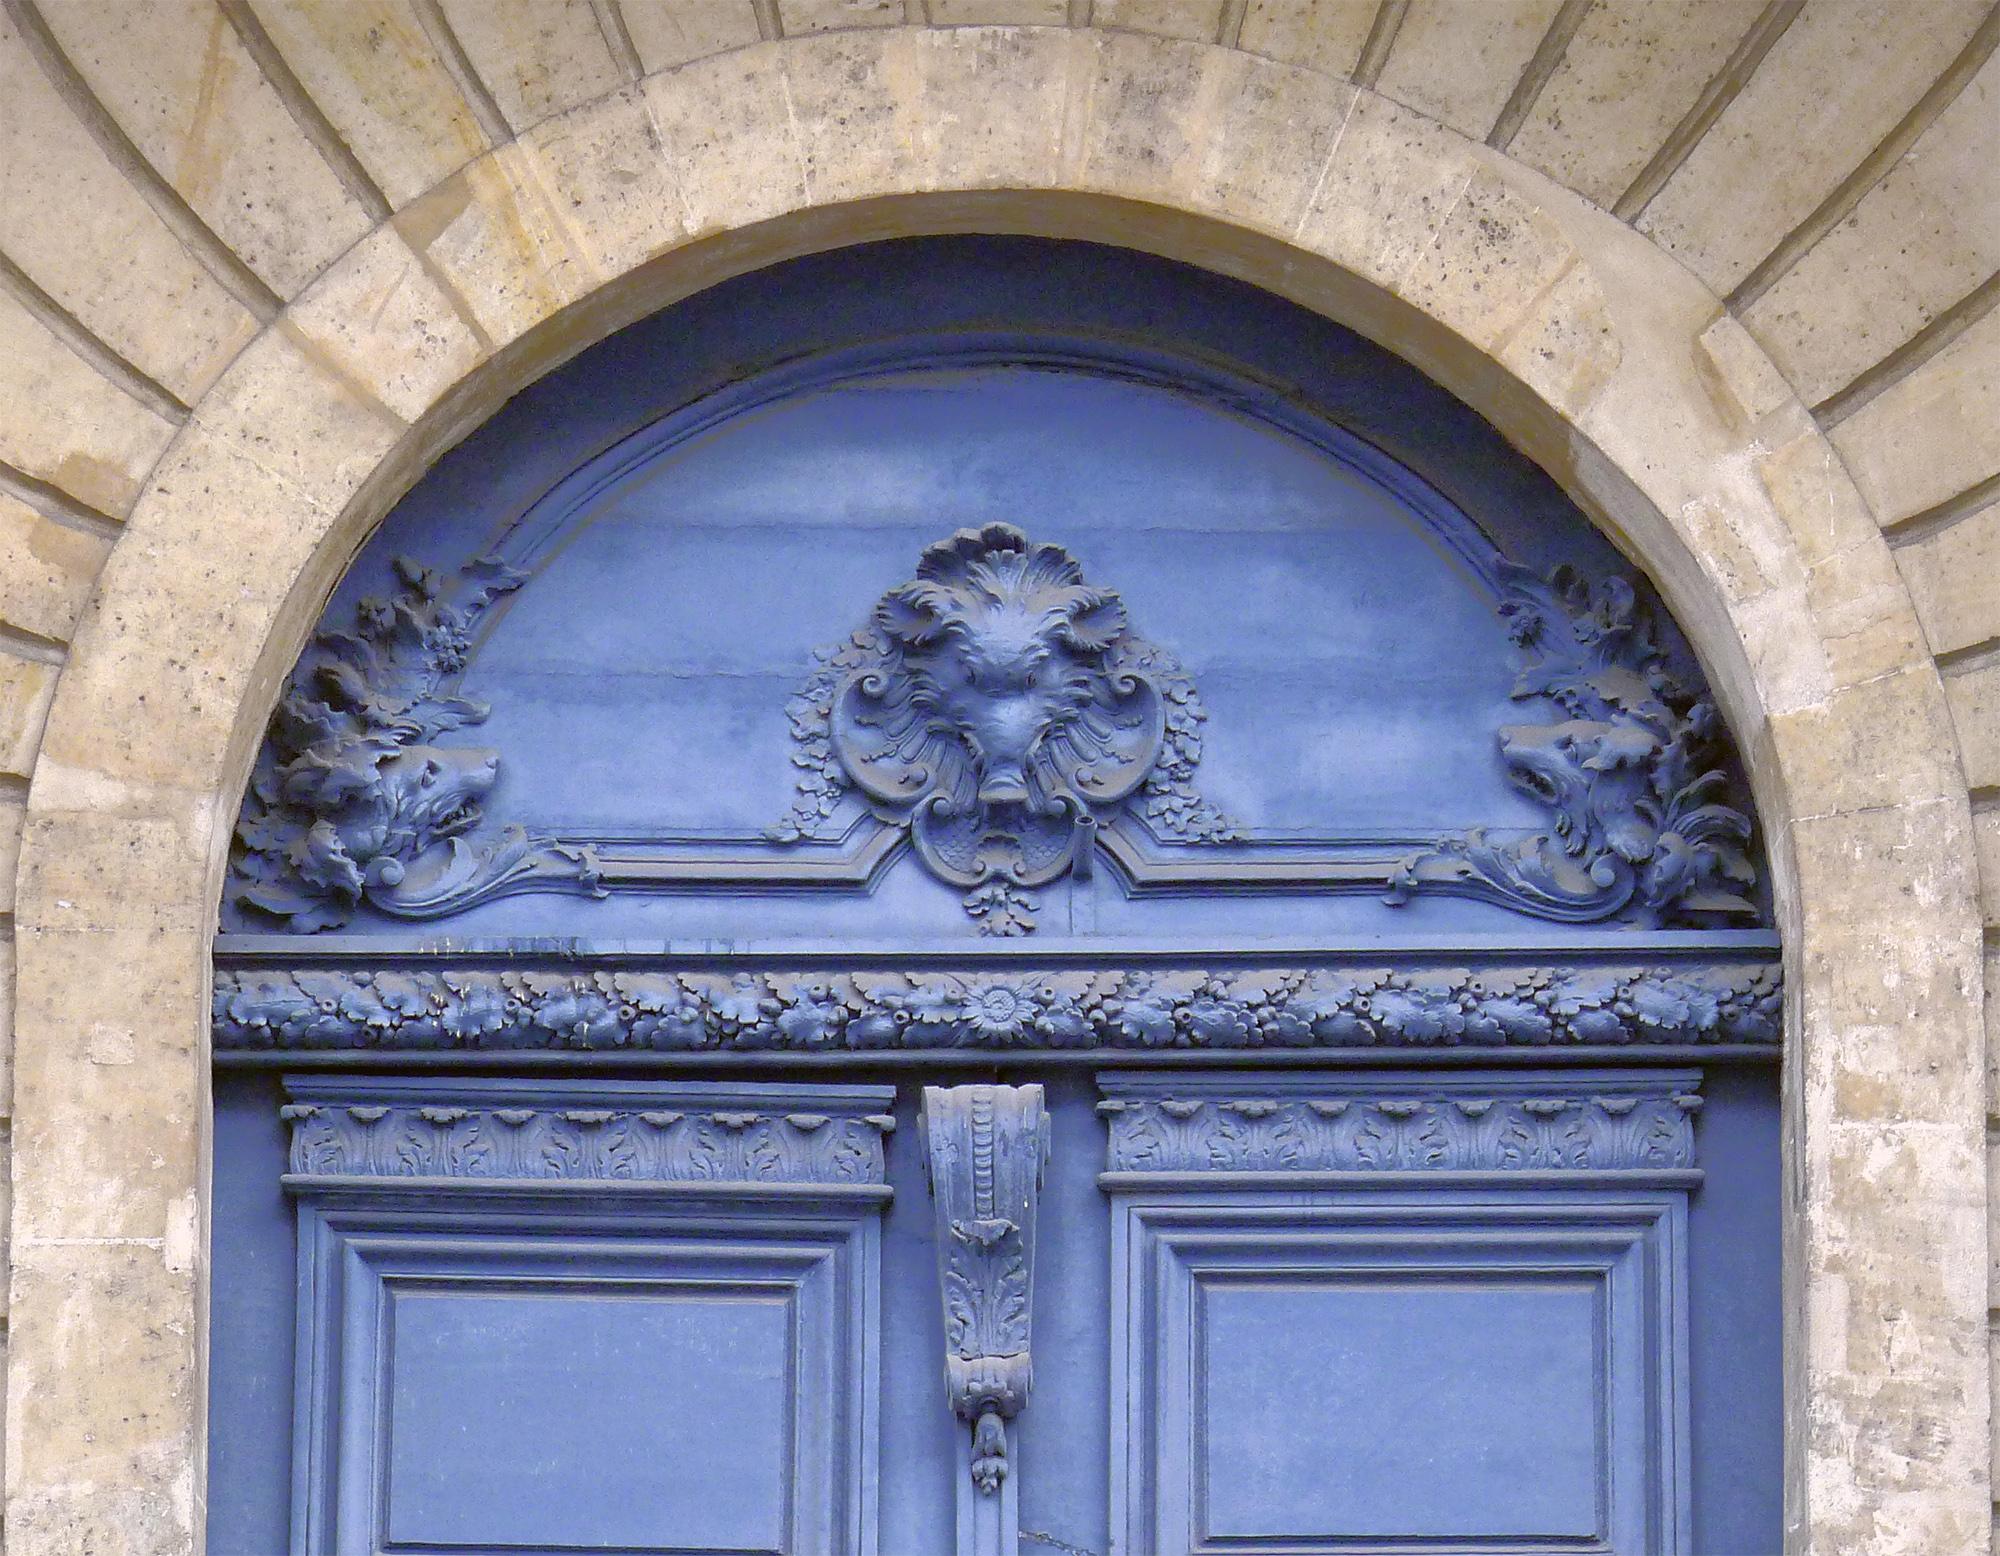 File:P1150039 Paris III rue de Turenne n°60 porte détail rwk.jpg ...